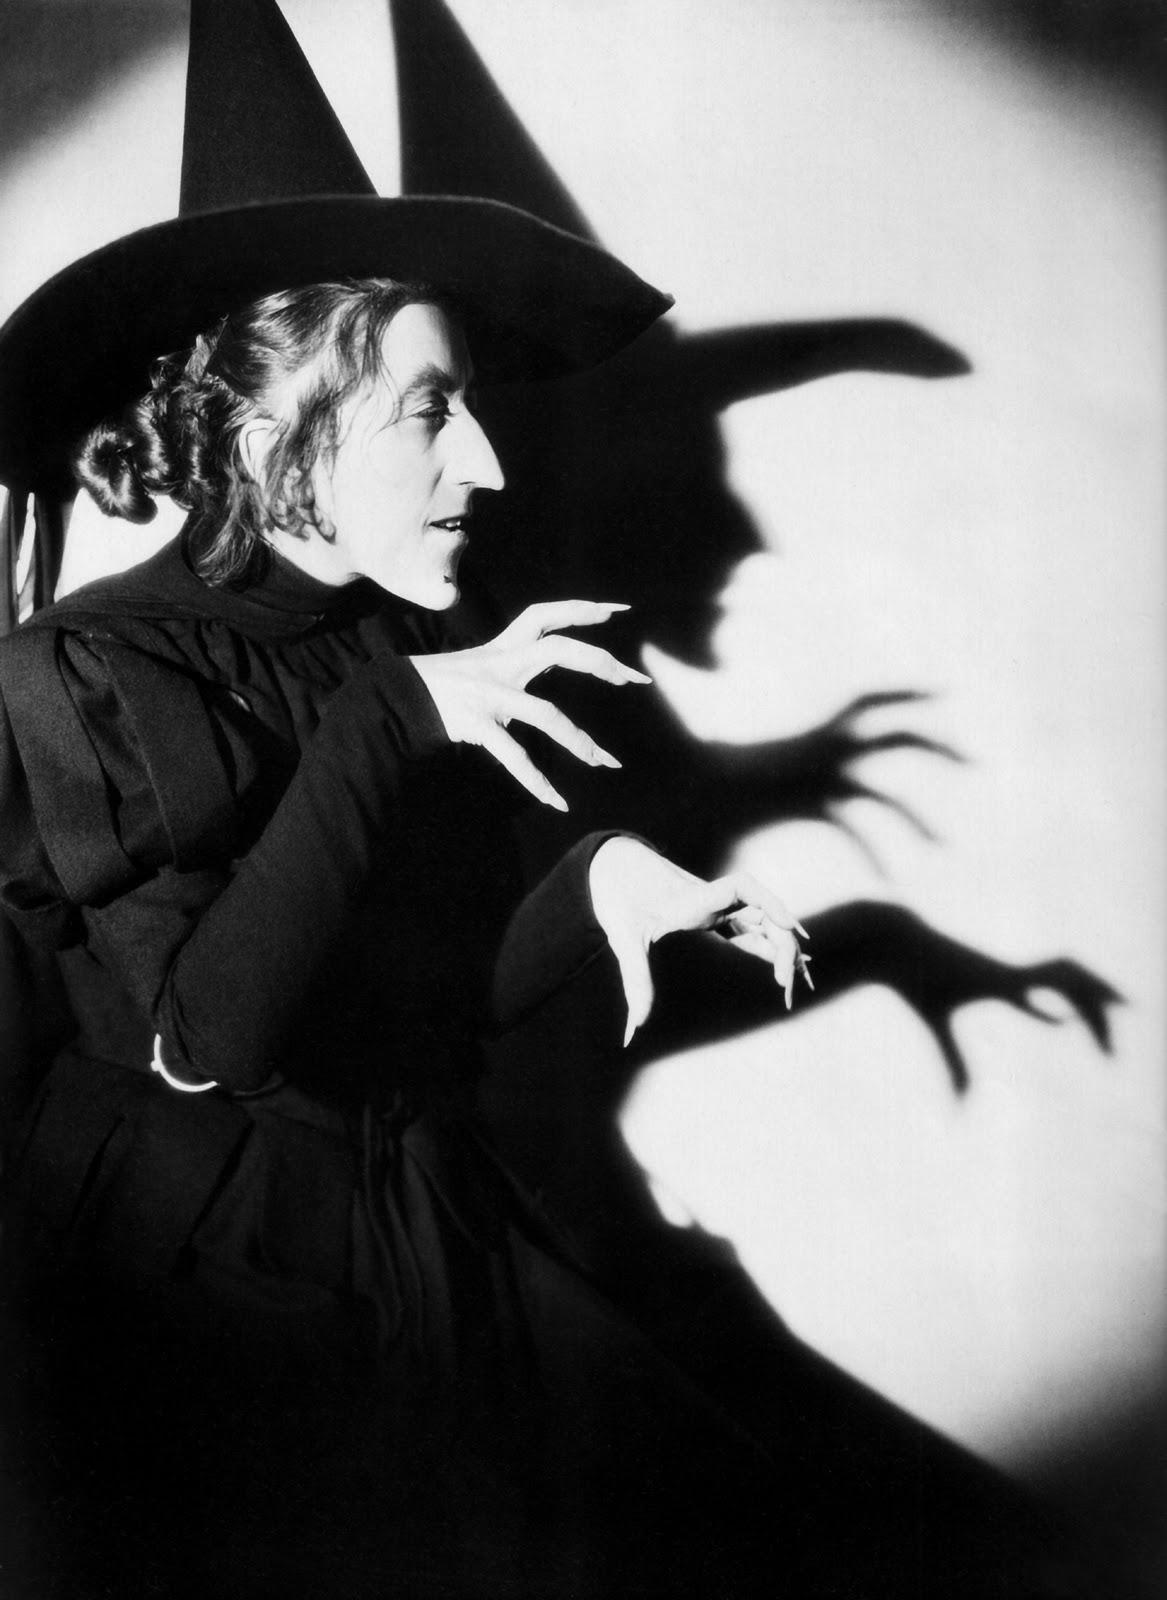 http://1.bp.blogspot.com/-HxvgZwHTEL4/TpXts-bRvUI/AAAAAAAAAC8/InEawyovnuw/s1600/wicked-witch-margaret-hamilton-1.jpg